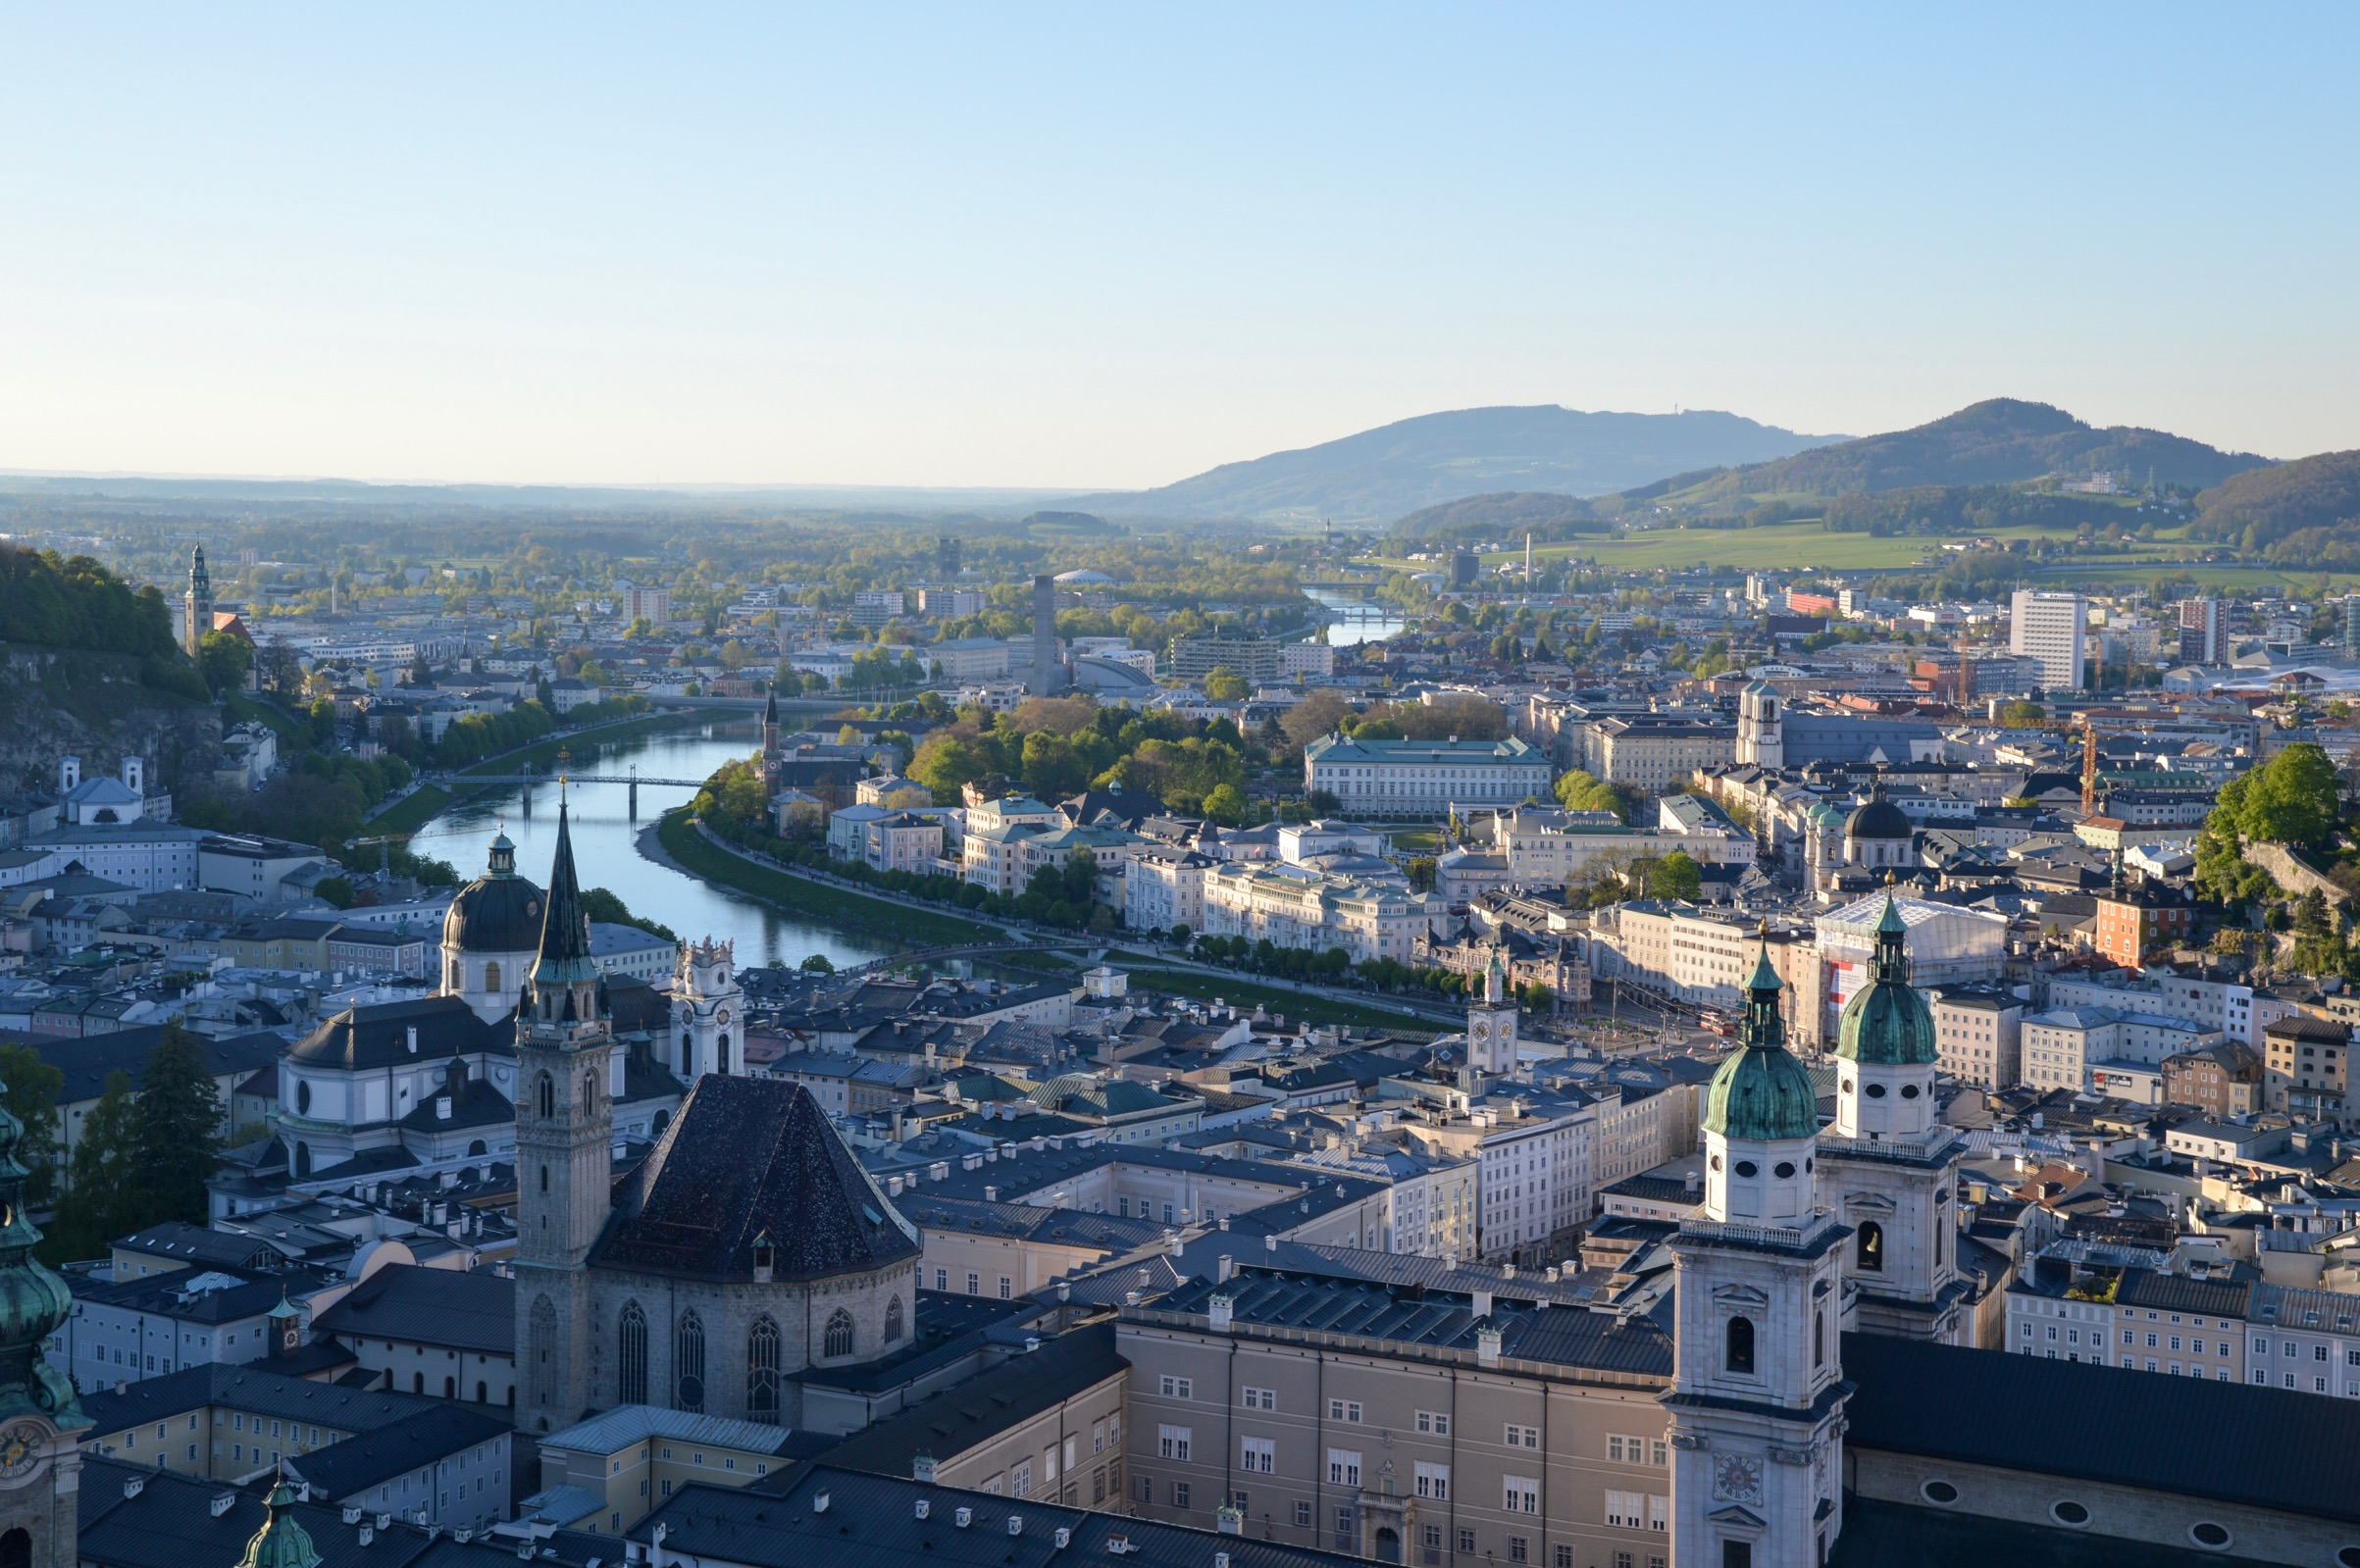 View from Hohensalzburg Castle, Salzburg, Austria